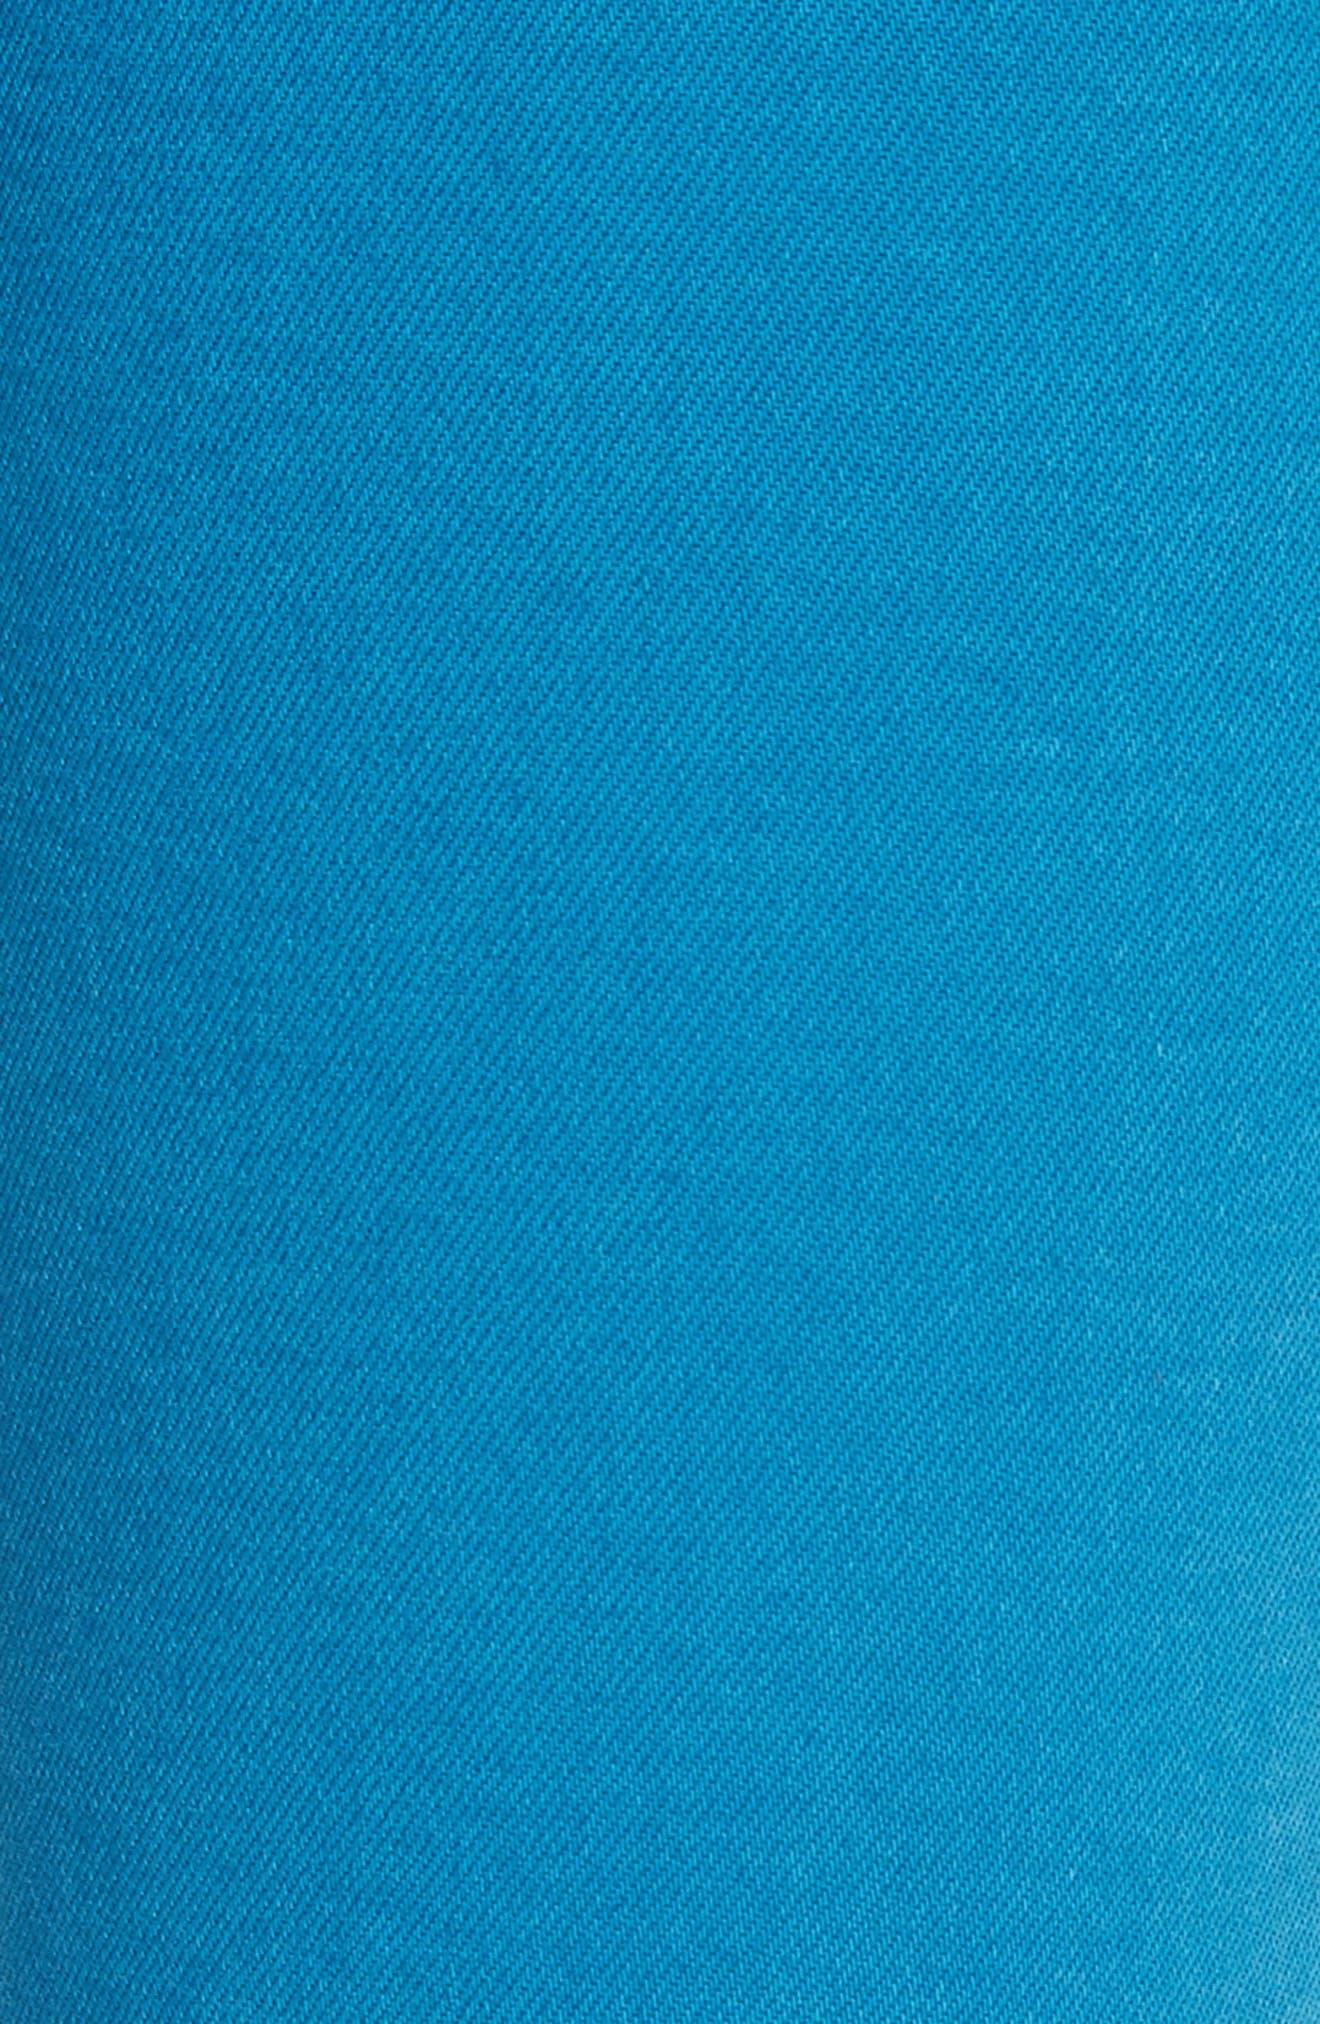 W4 Shelter Wide Leg Crop Jeans,                             Alternate thumbnail 5, color,                             PEACOCK BLUE